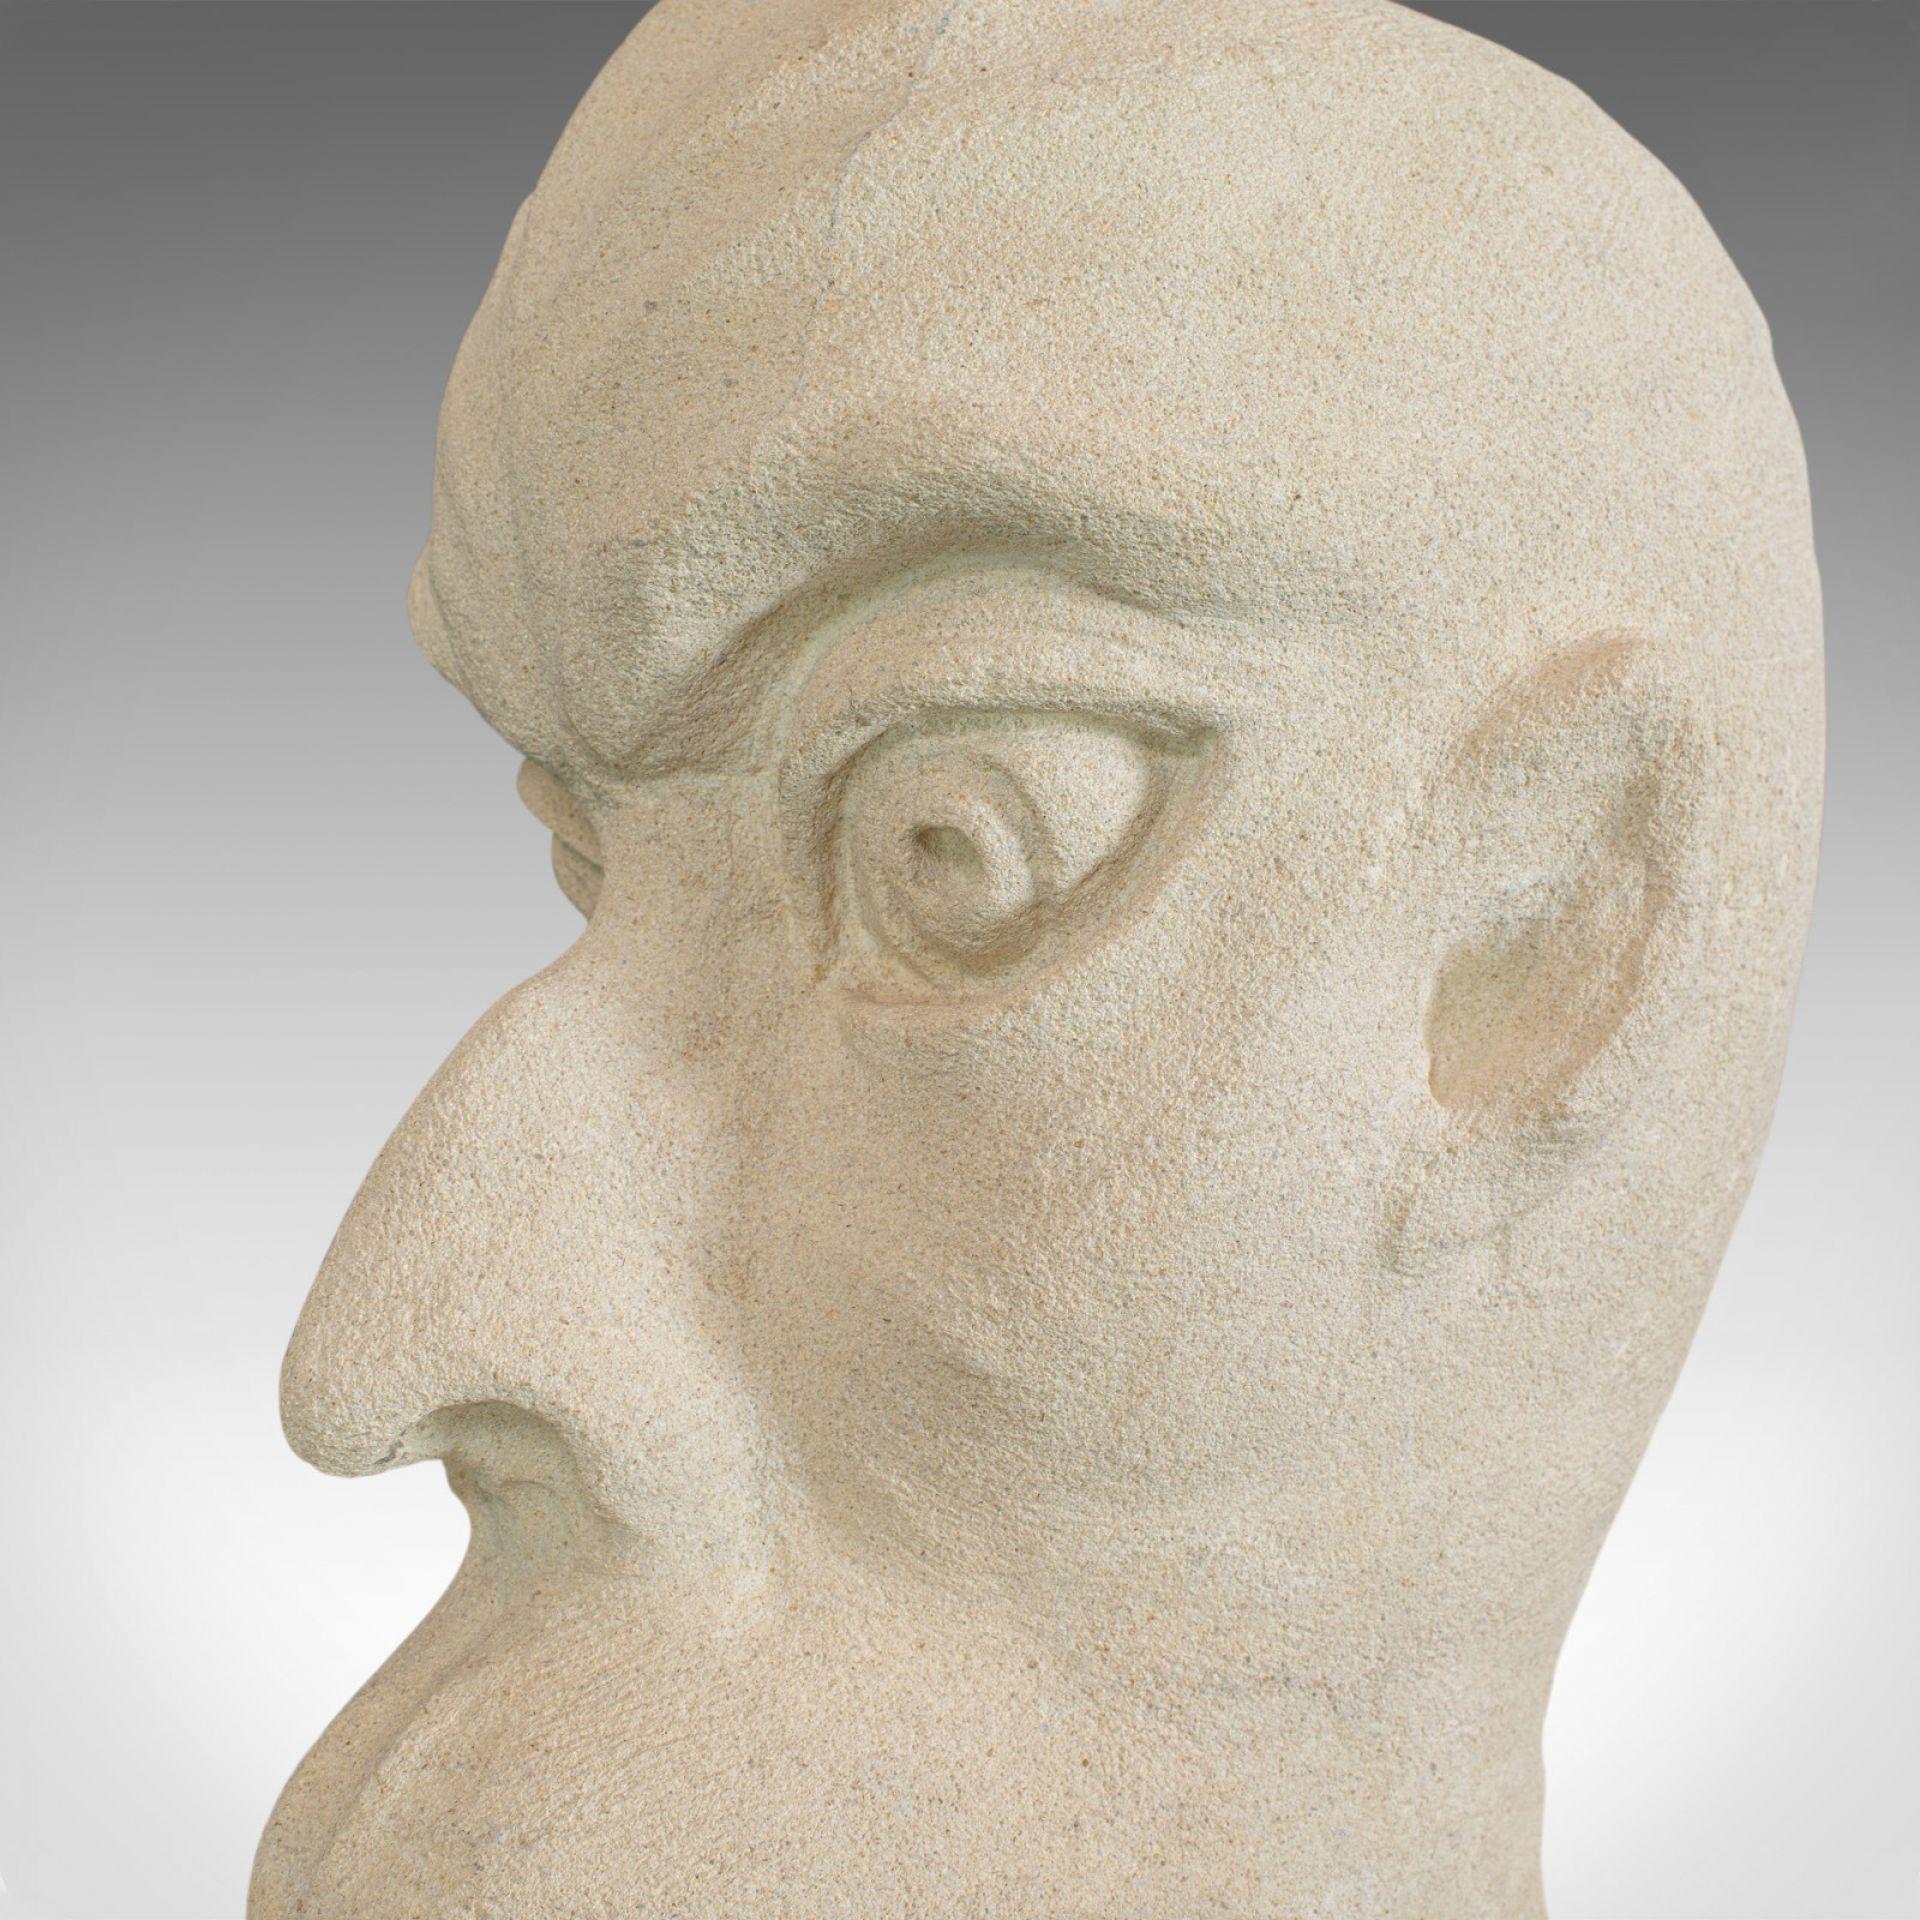 Marvin' Sculptural Artwork, Dominic Hurley, English, Bath Stone, Bust